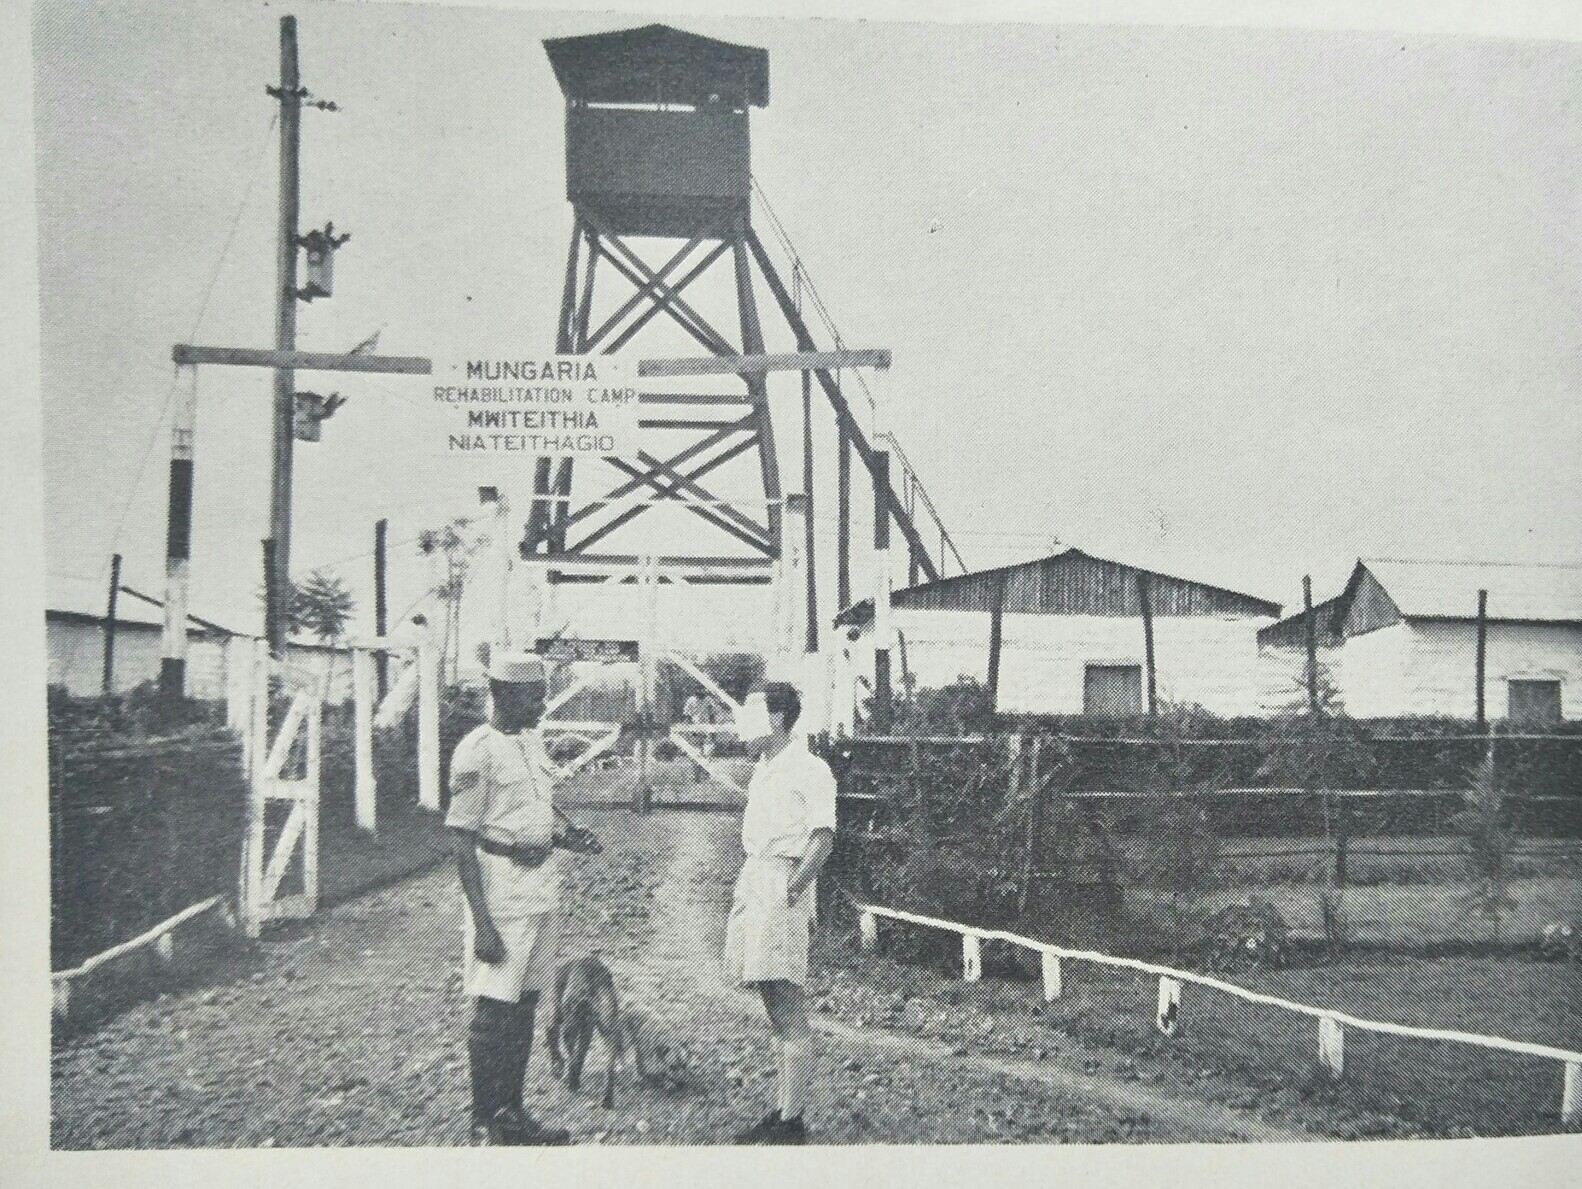 View of Aguthi (Mungaria) Work Camp, from J.M. Kariuki's 1963 book 'Mau Mau Detainee'.